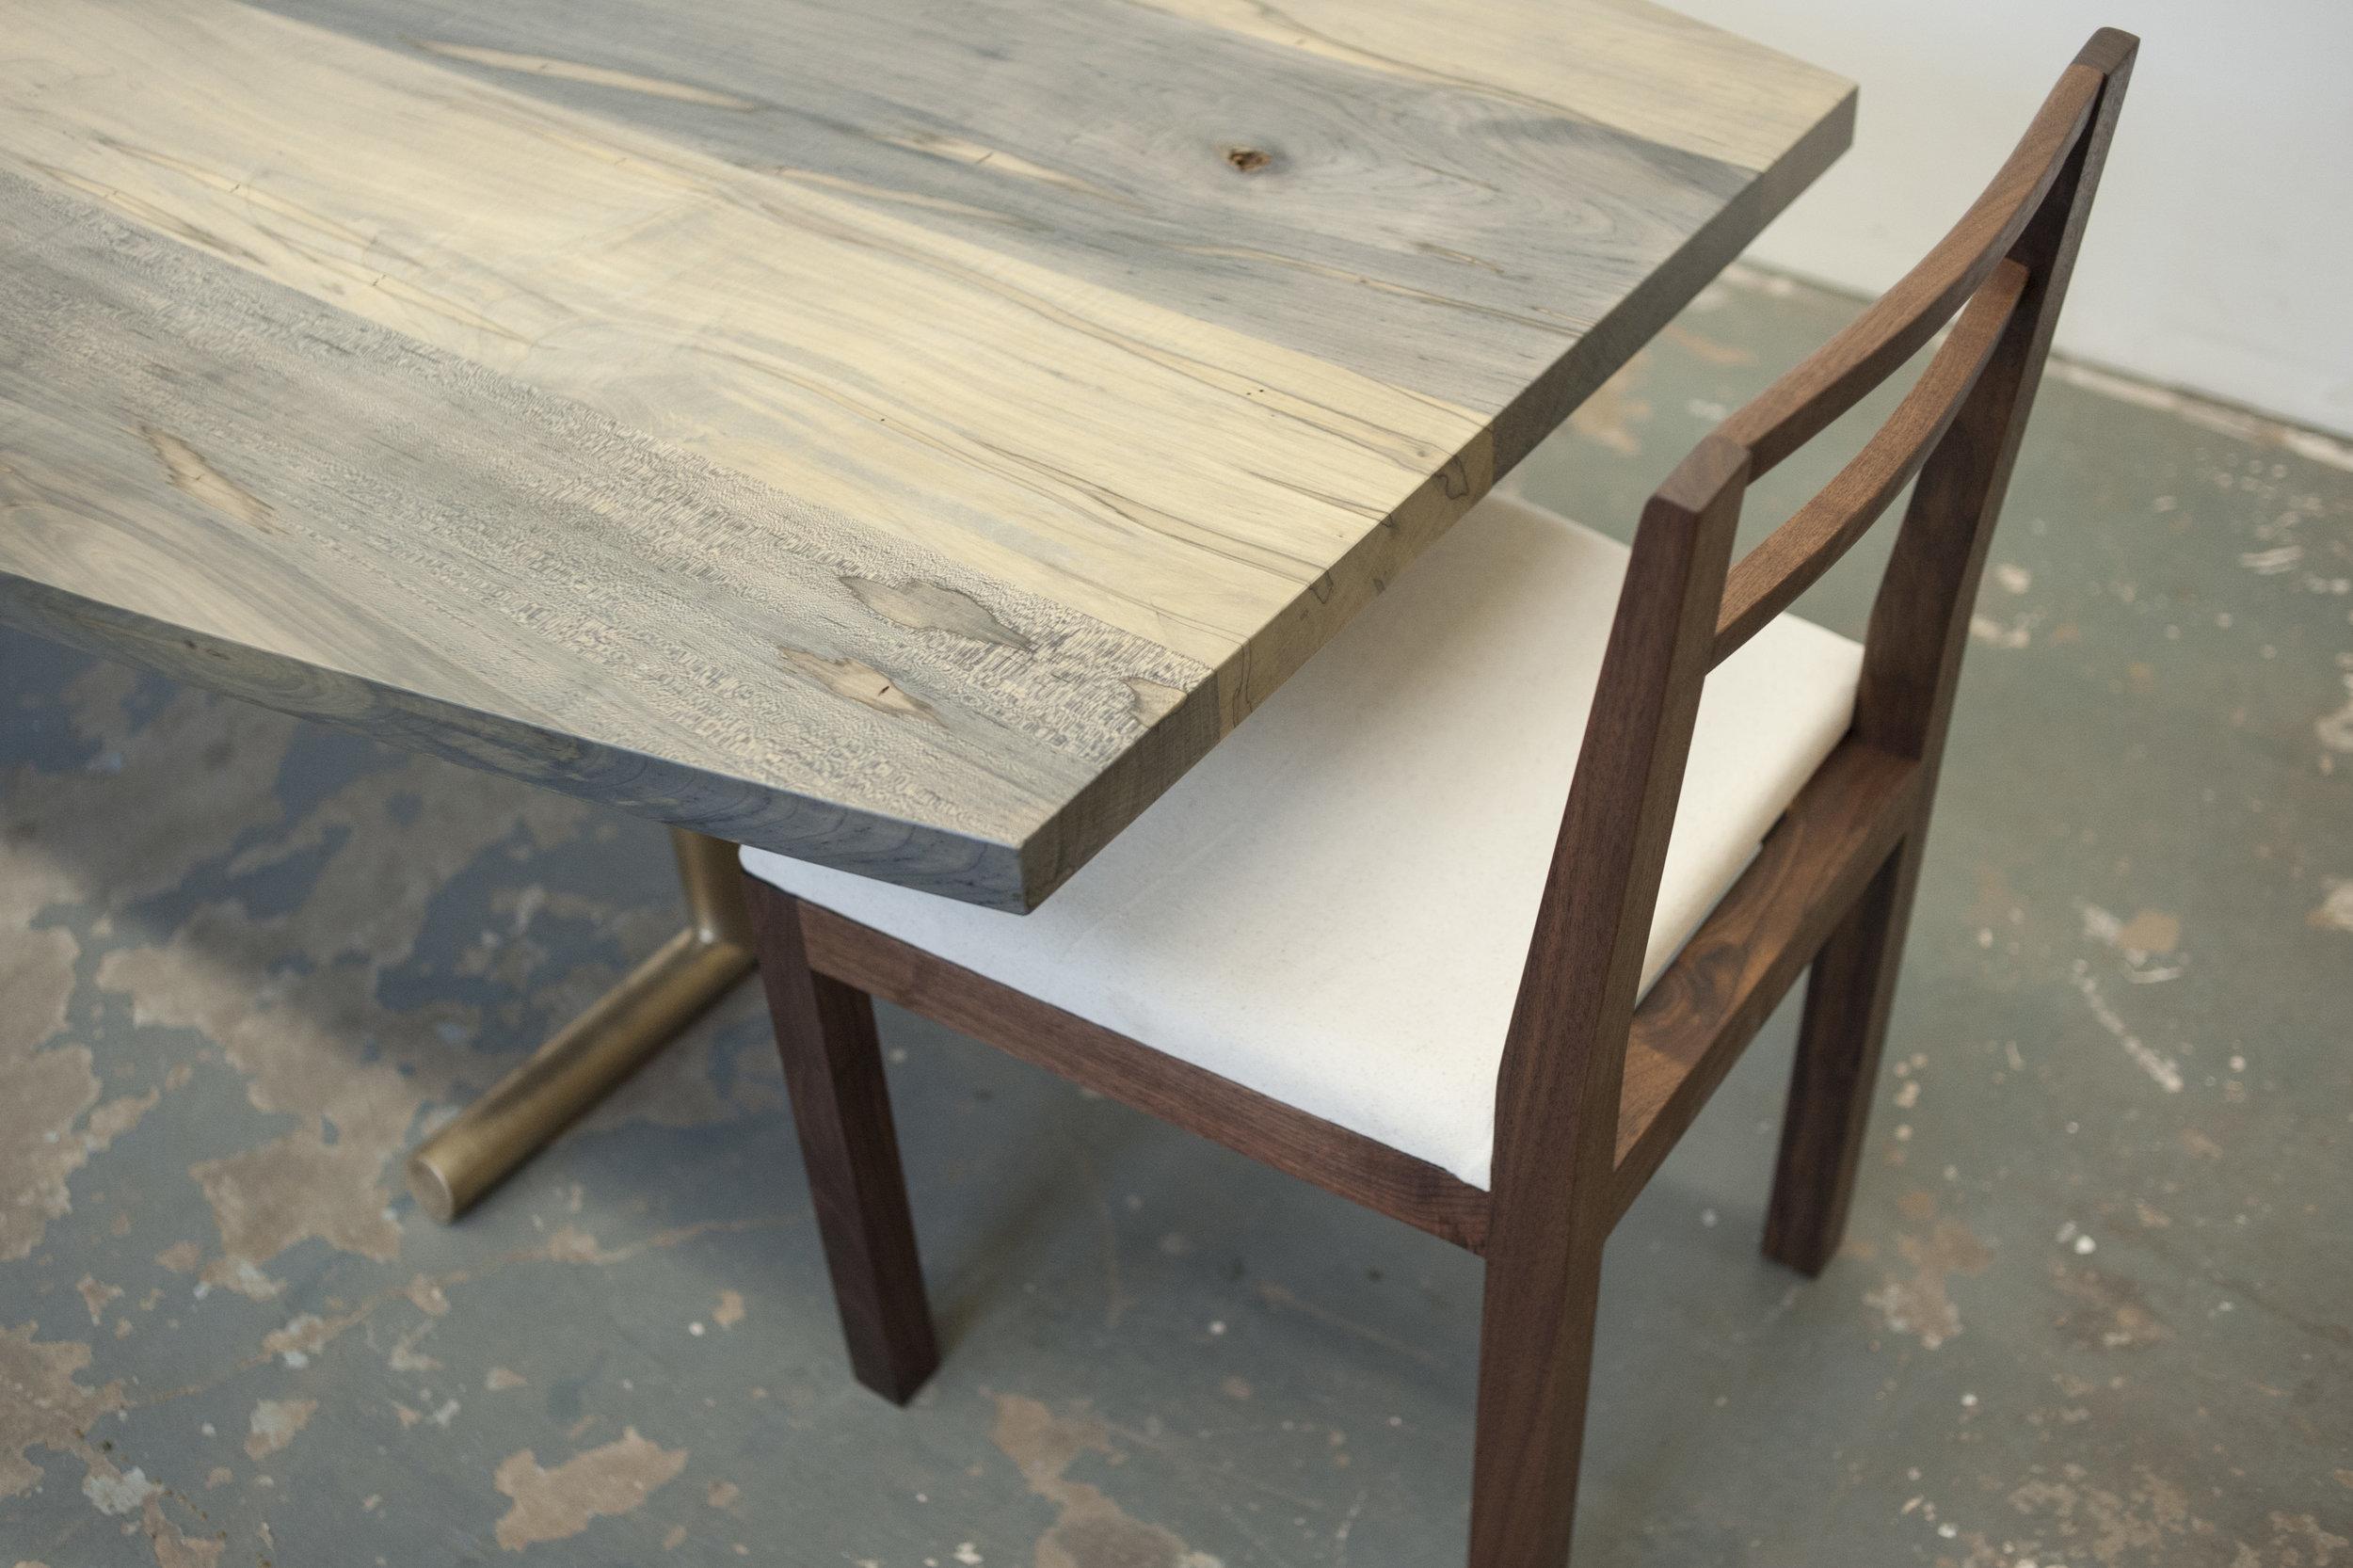 Olivr_Studio_Dining_Table_3.jpg